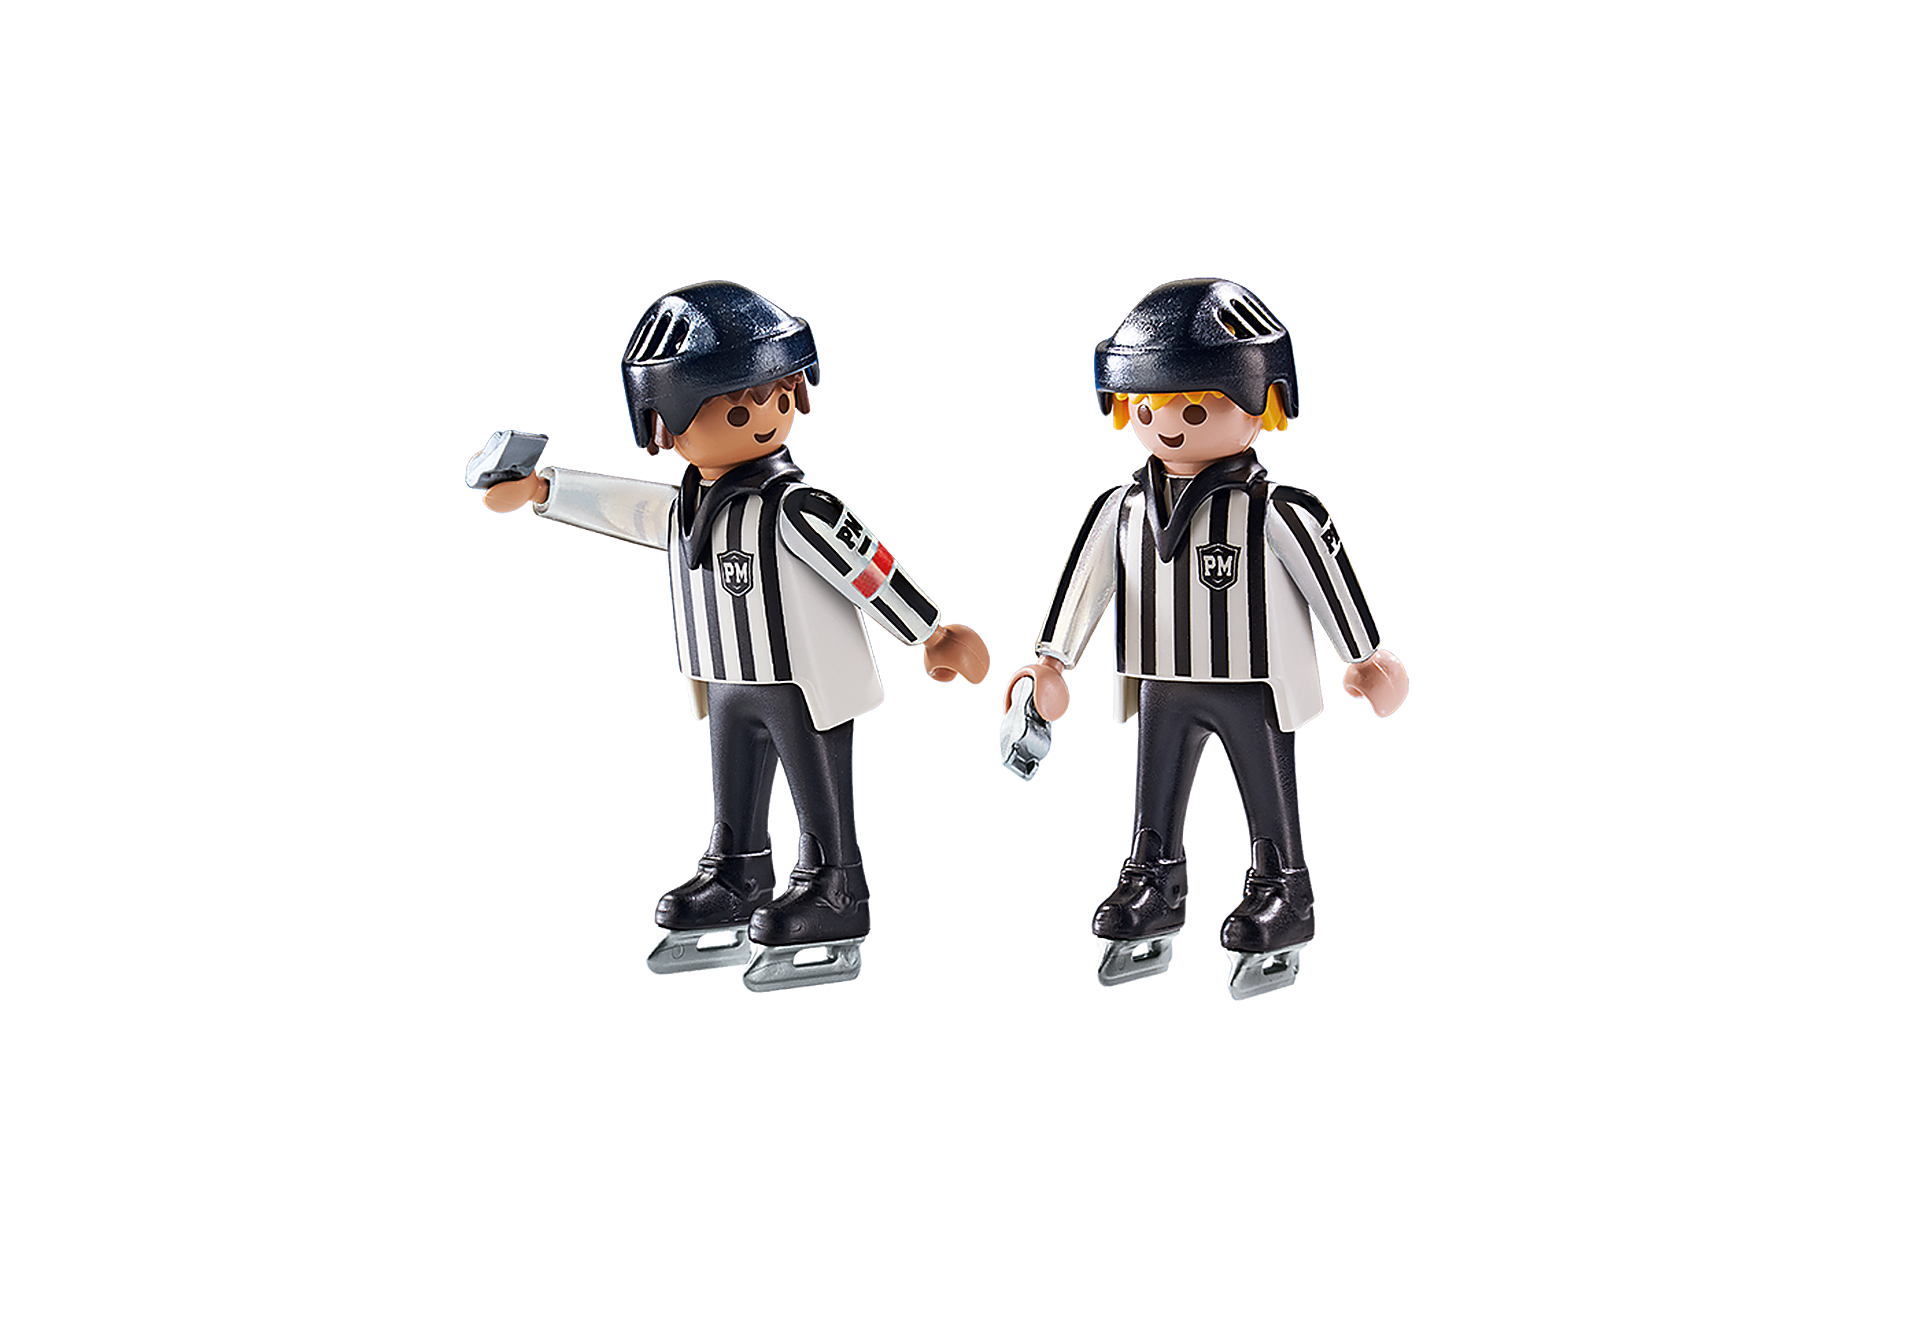 6191 Ice Hockey Referees zoom image4